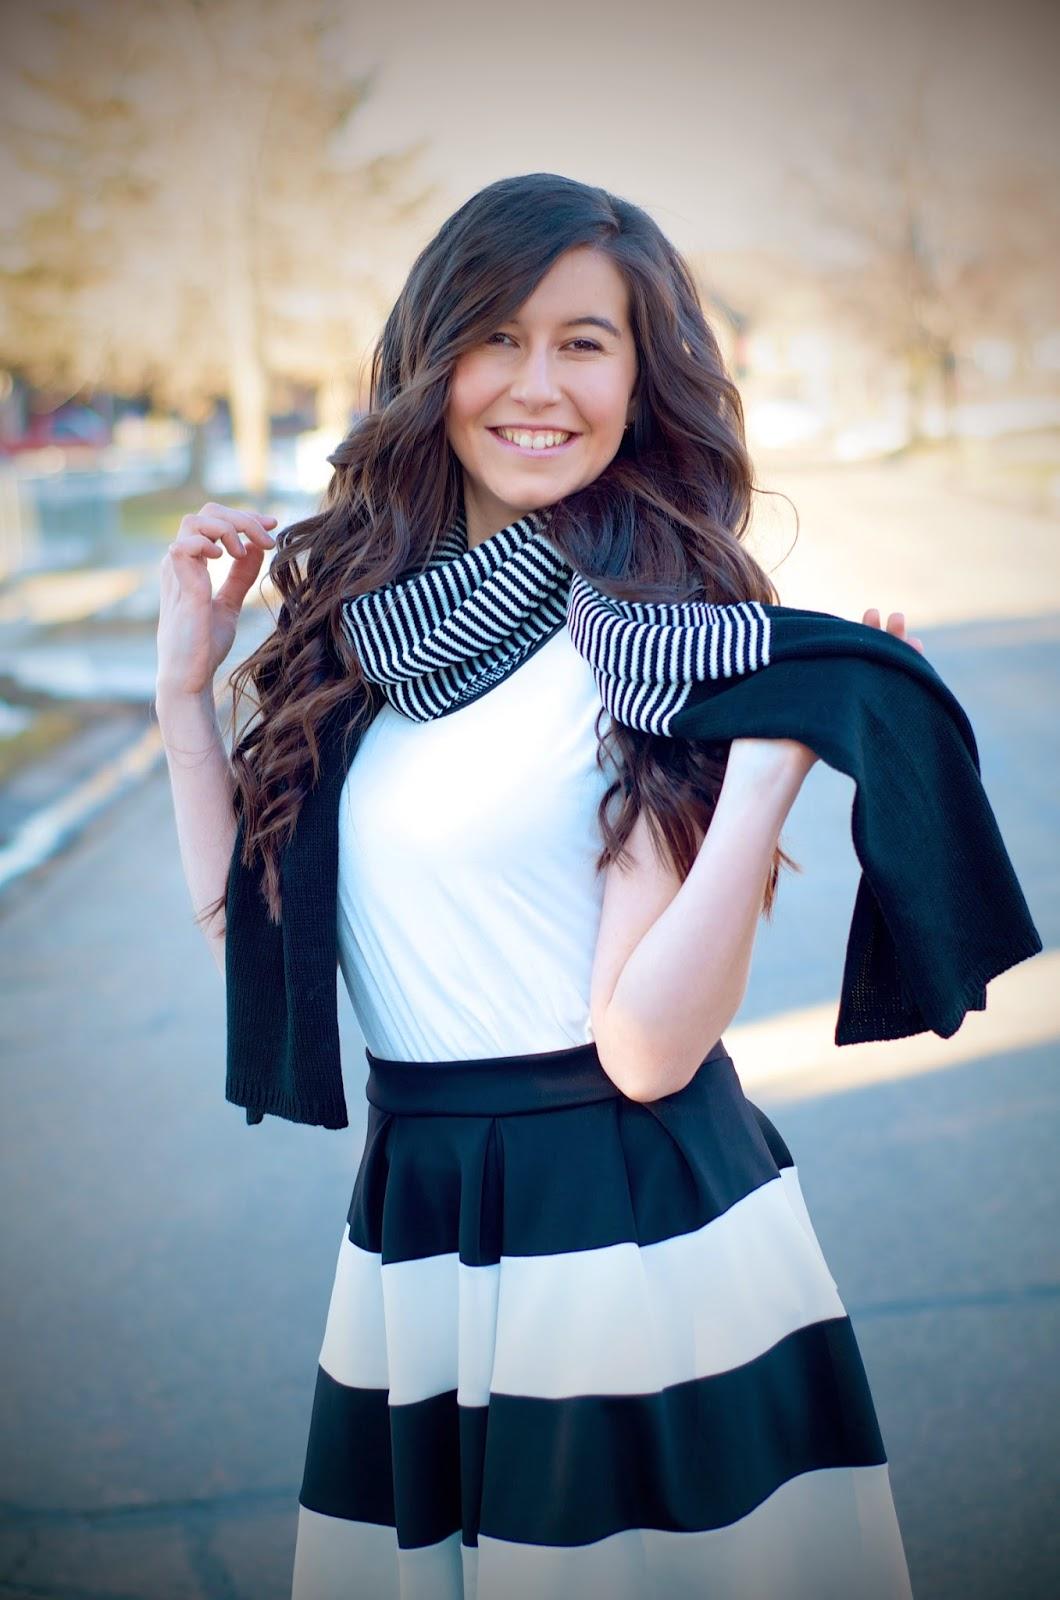 black and white outfit, edward eliason photography, persunmall, persun mall, scarf, black and white scarf, stripes, windsor store, windsor style, striped skirt, fit and flare, fit and flare skirt,